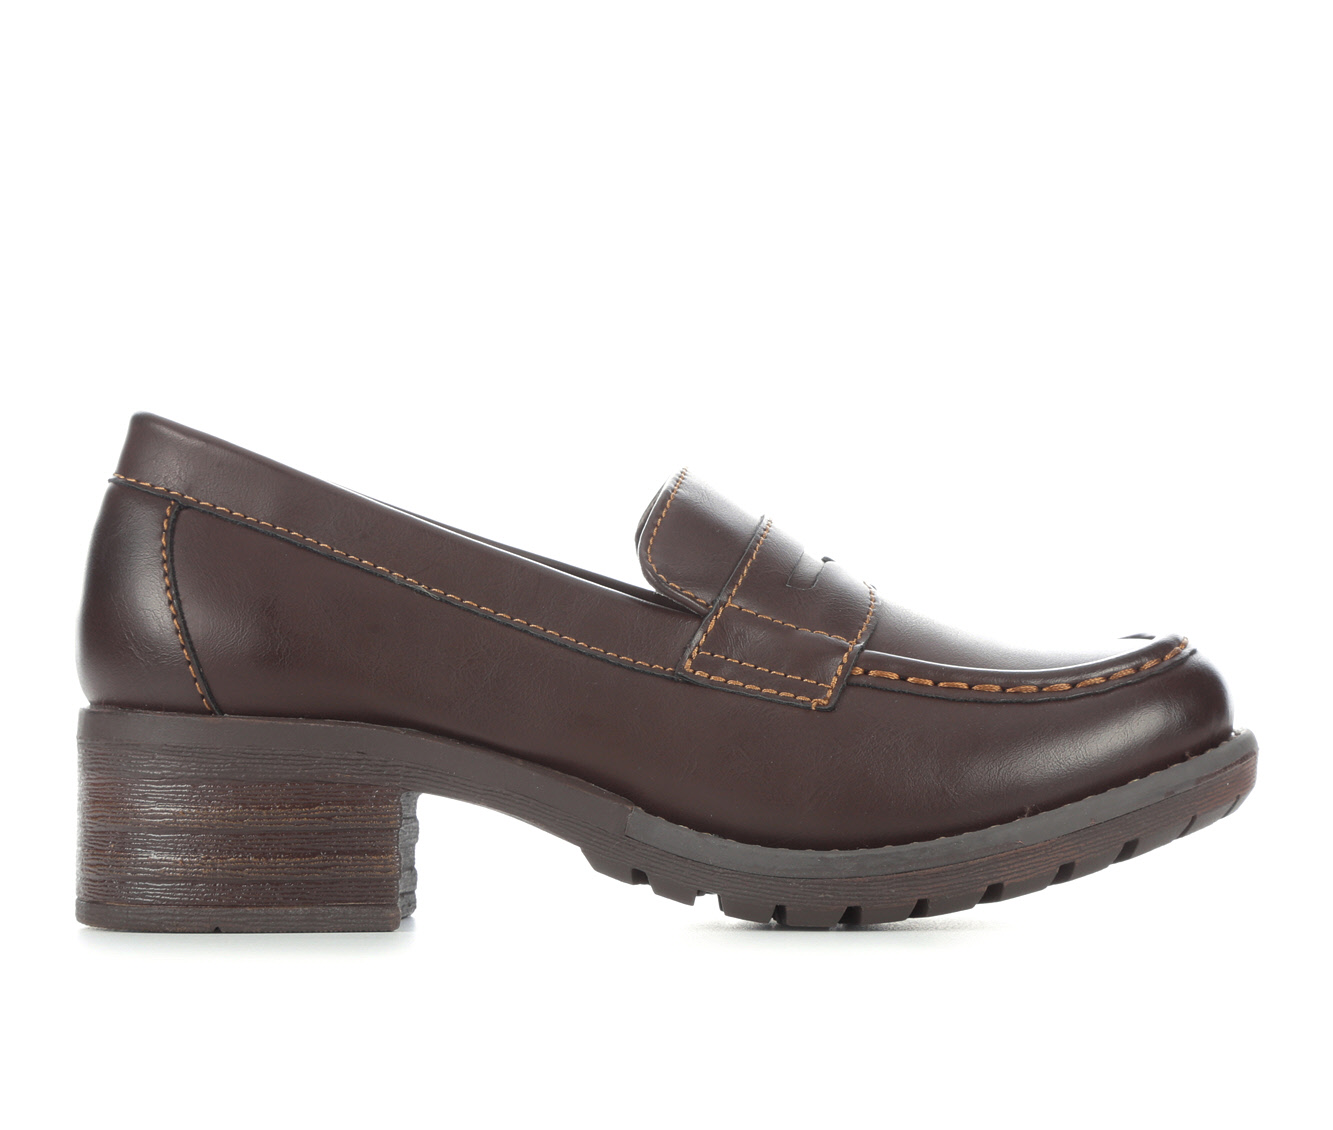 Eastland Holly Women's Shoe (Brown Faux Leather)